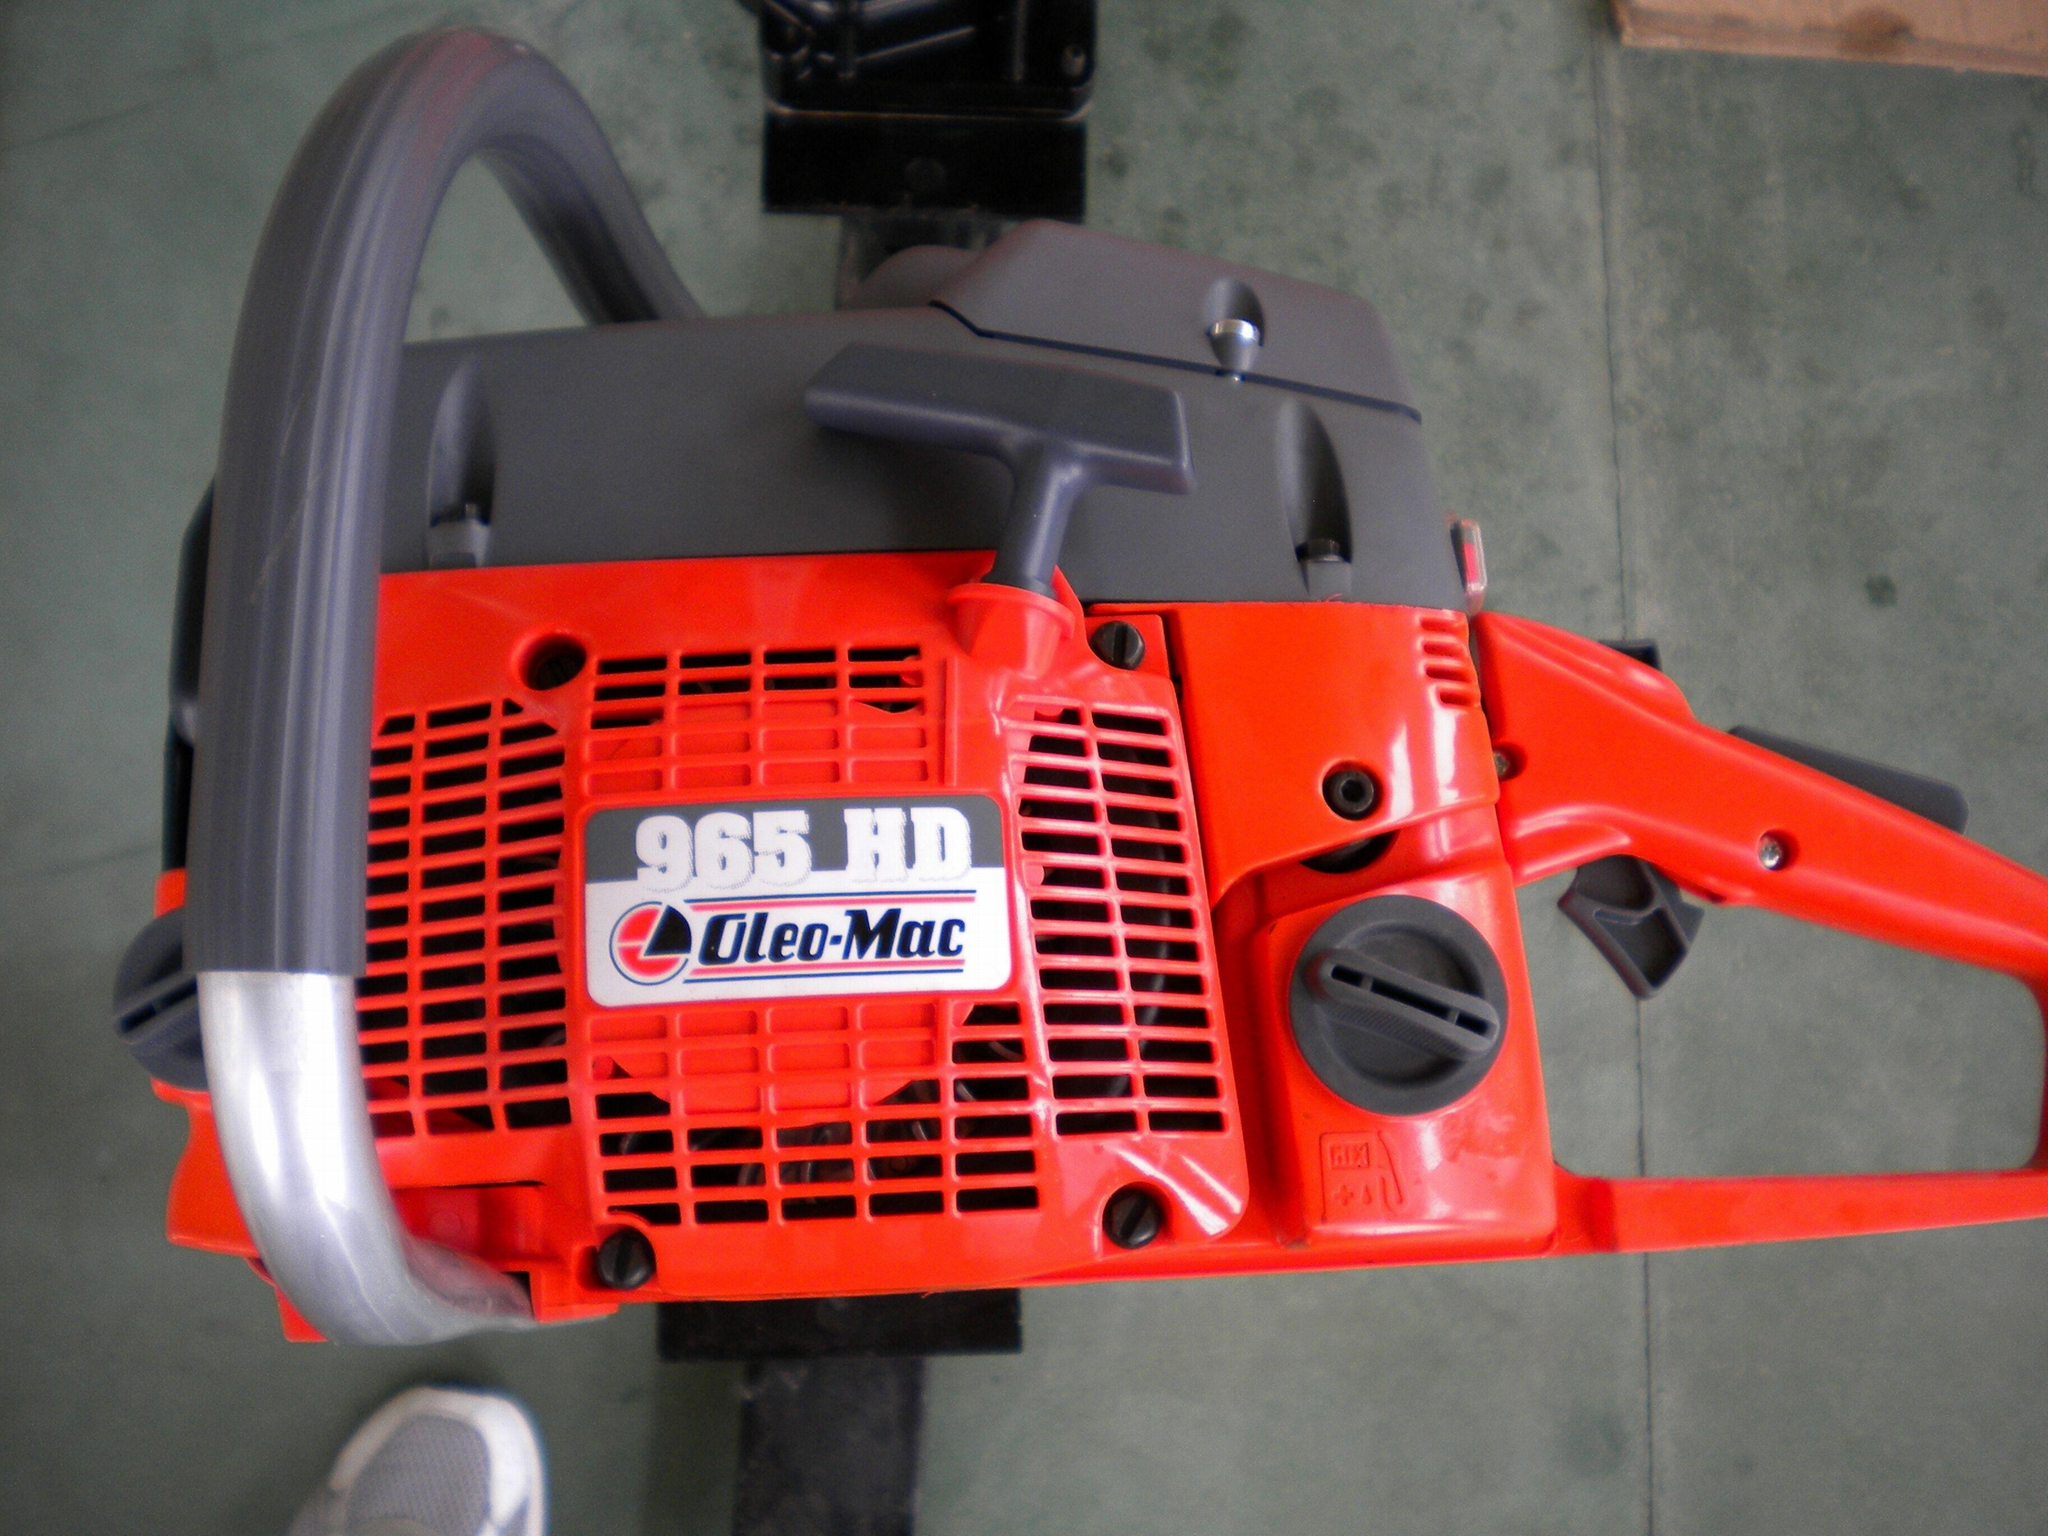 Railway maintenance Torque adjustable internal combustion bolt wrench NLB-1200 11